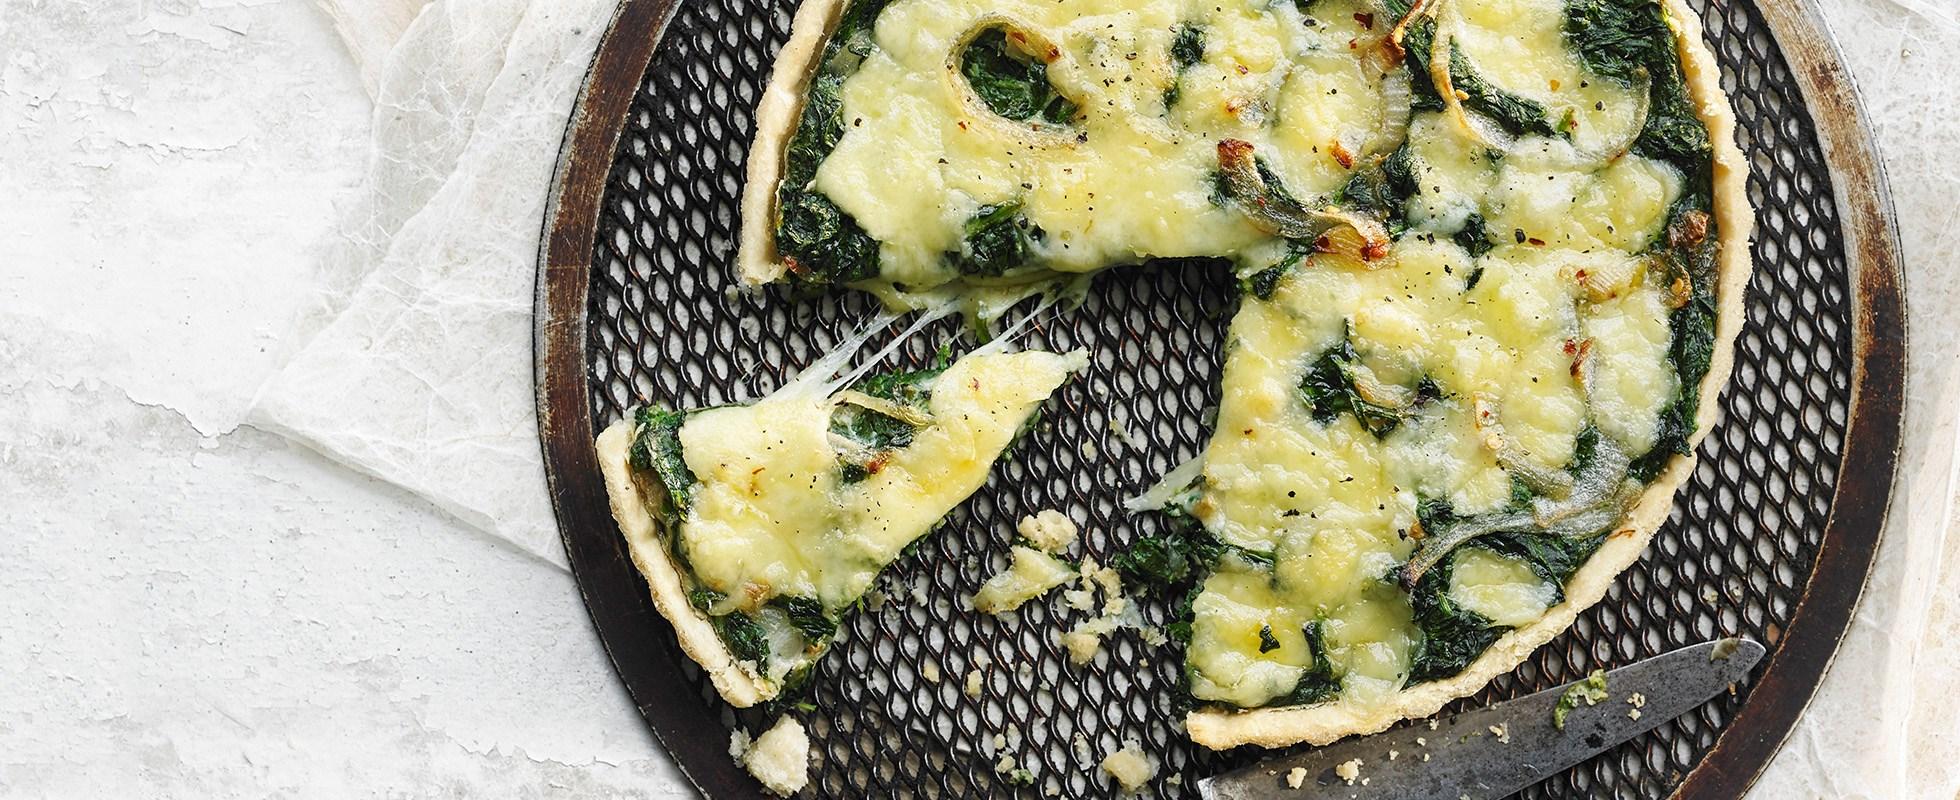 Spinach and fontina tart